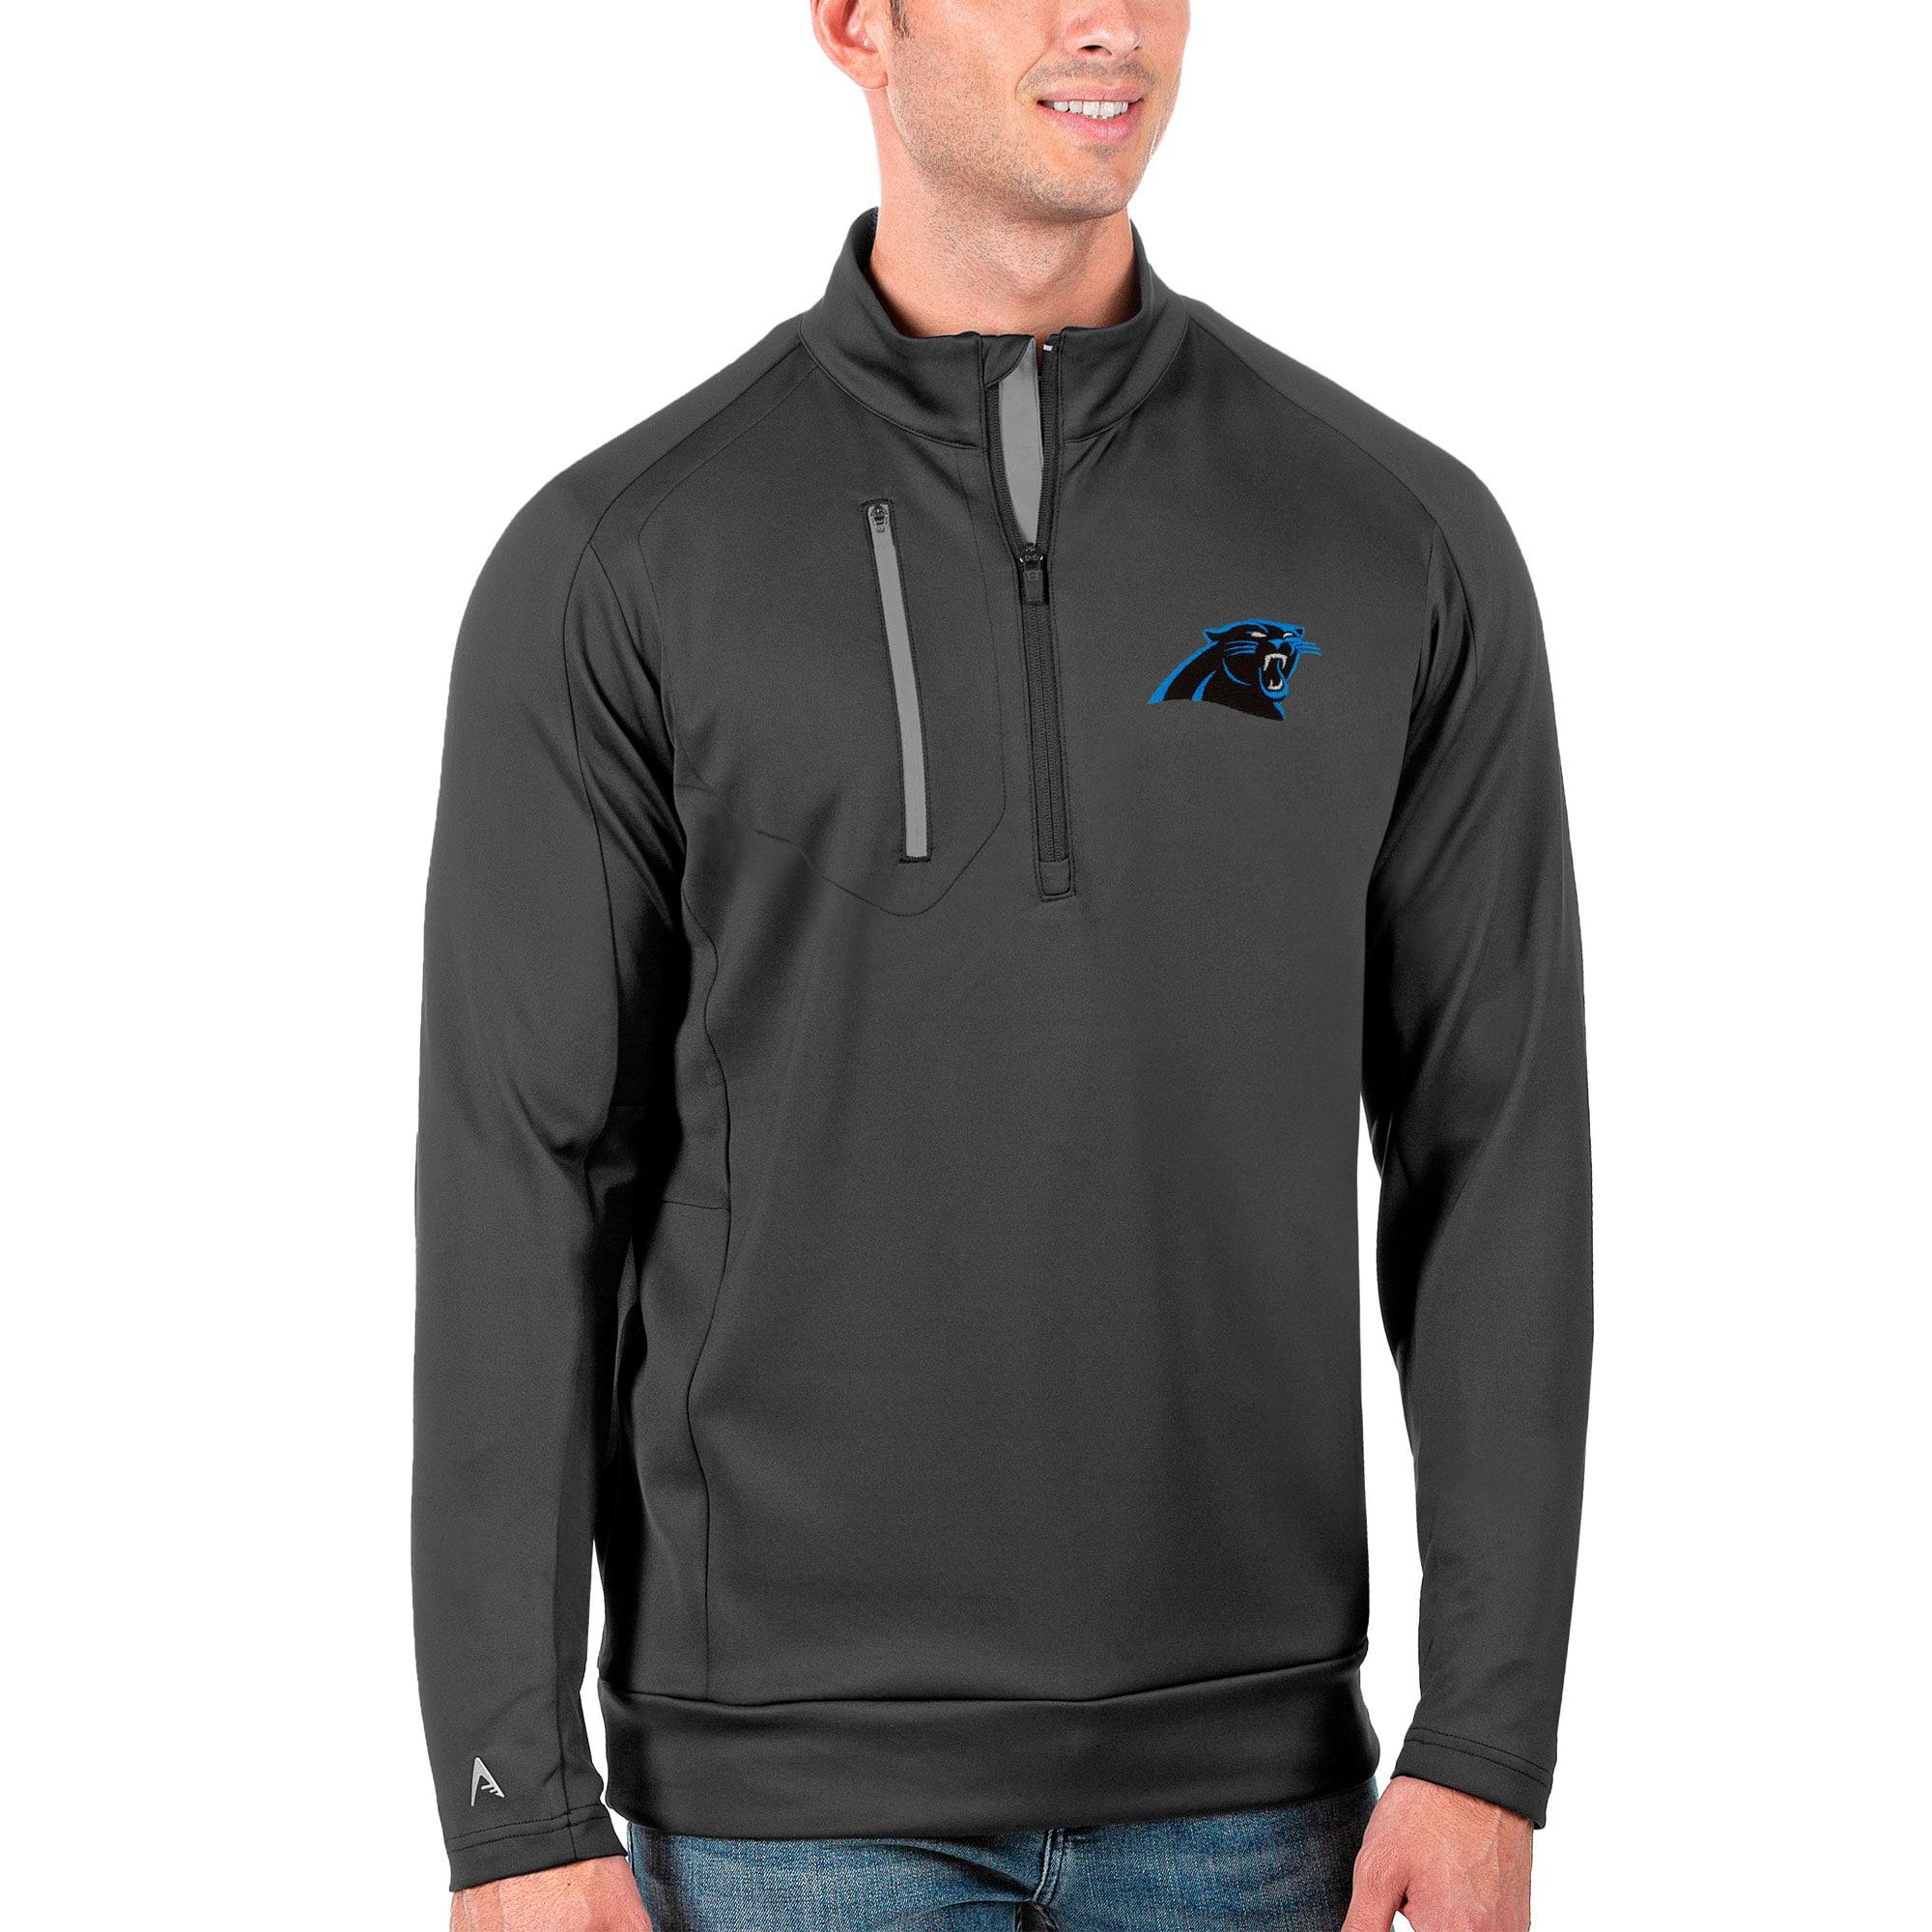 Carolina Panthers Antigua Generation Quarter-Zip Pullover Jacket - Charcoal/Silver